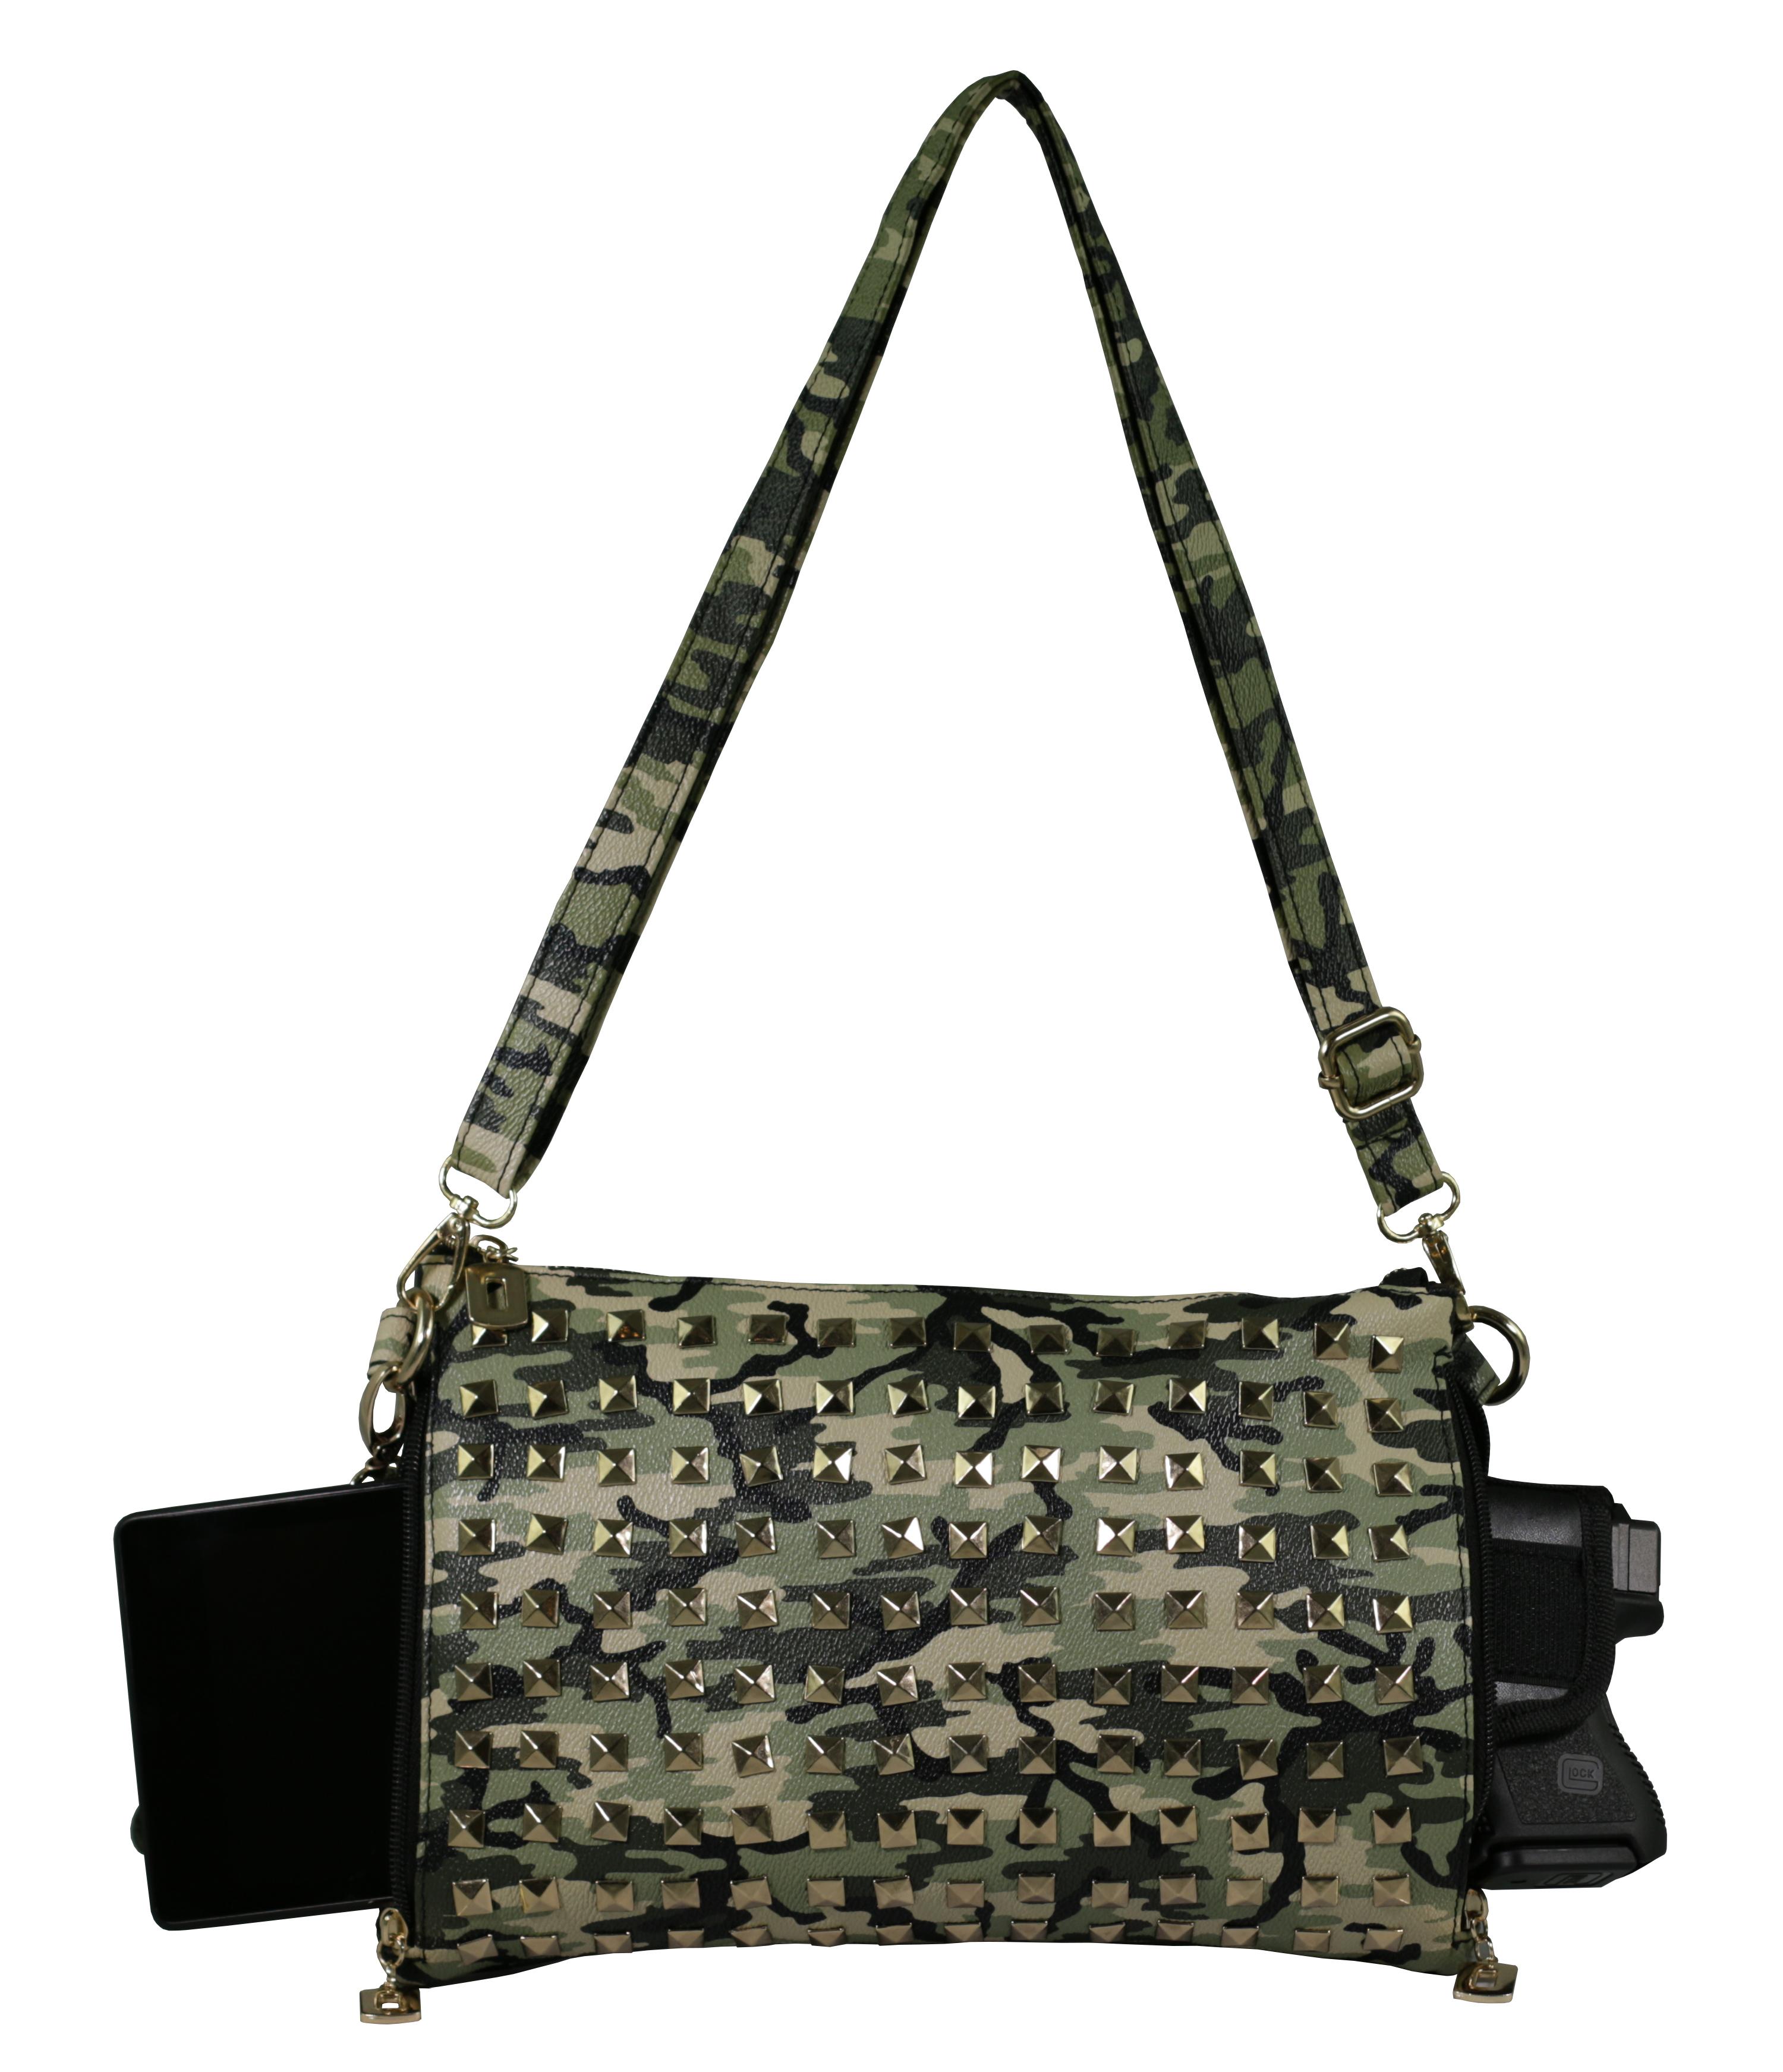 Green Camo Studded <br> Crossbody/Clutch/Shoulder <br> Concealed Carry Handbag <br> with Custom Holster